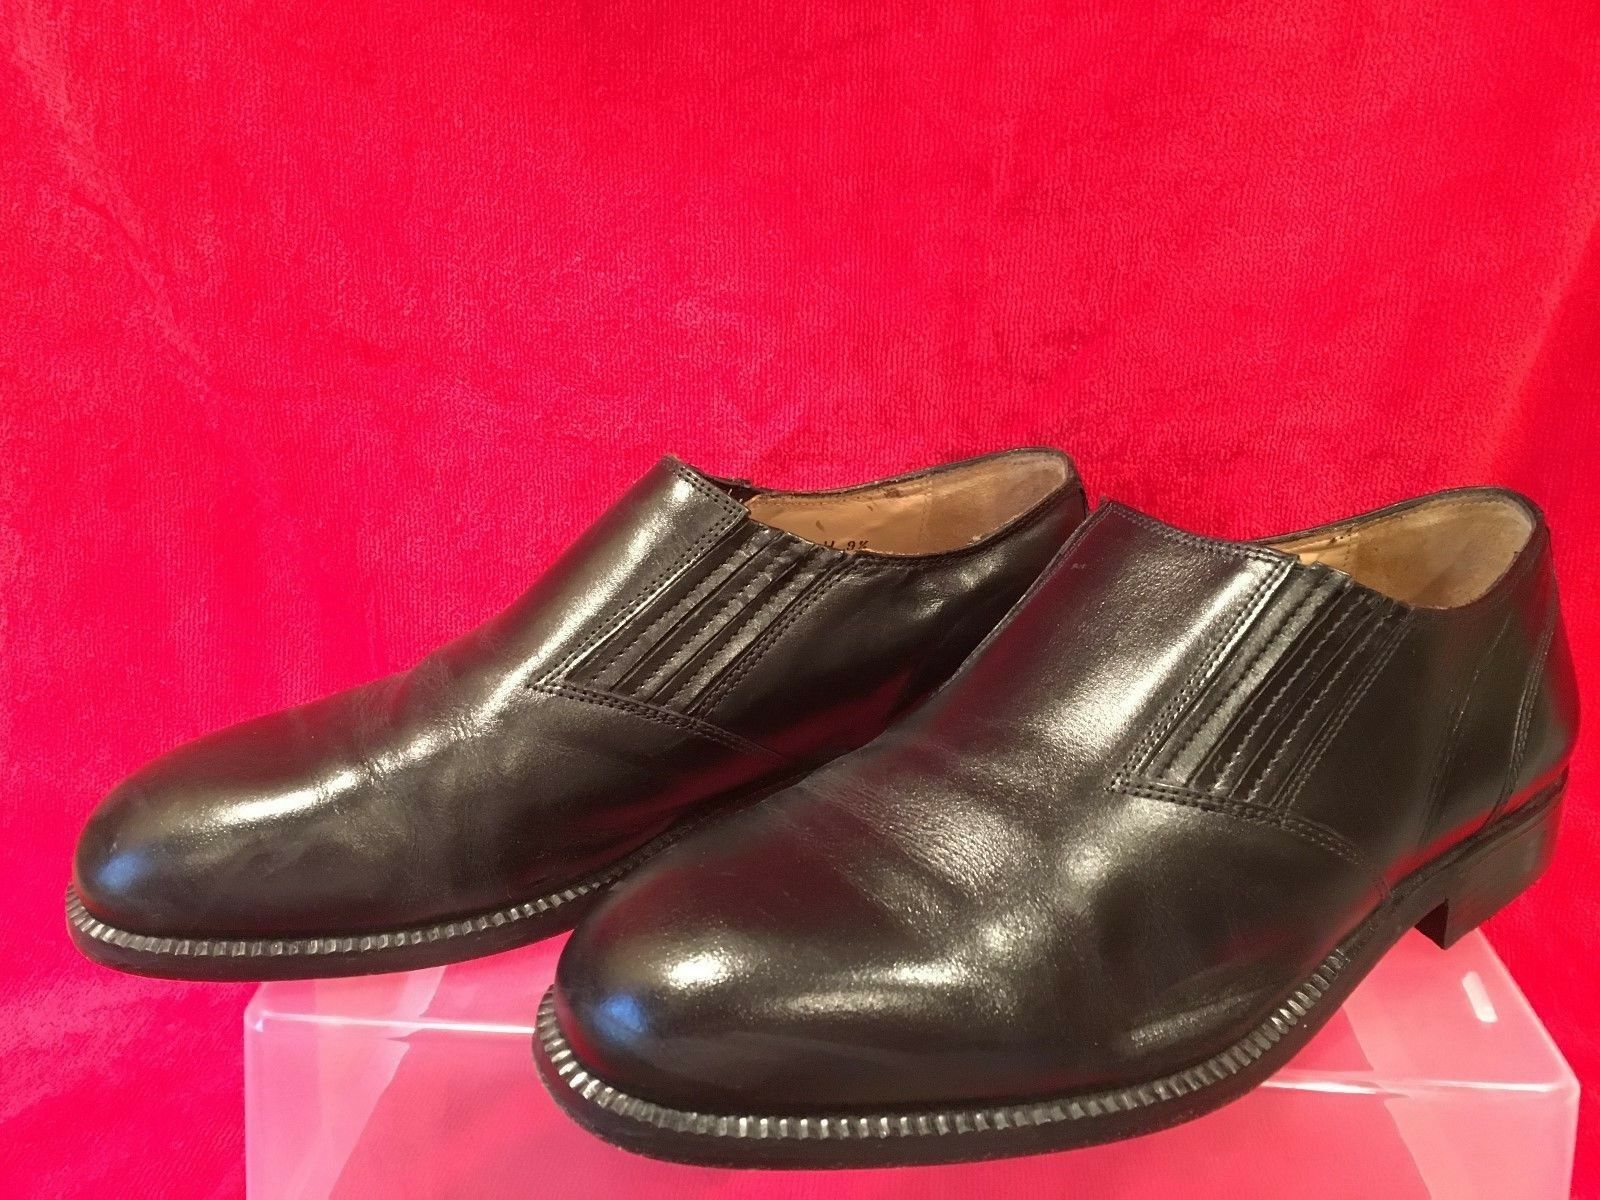 MEN'S SZ STANLEY BLACKER COUTURE BLACK LEATHER DRESS SLIP-ON SHOES SZ MEN'S 9.5 W  ITALY 5f2ddc